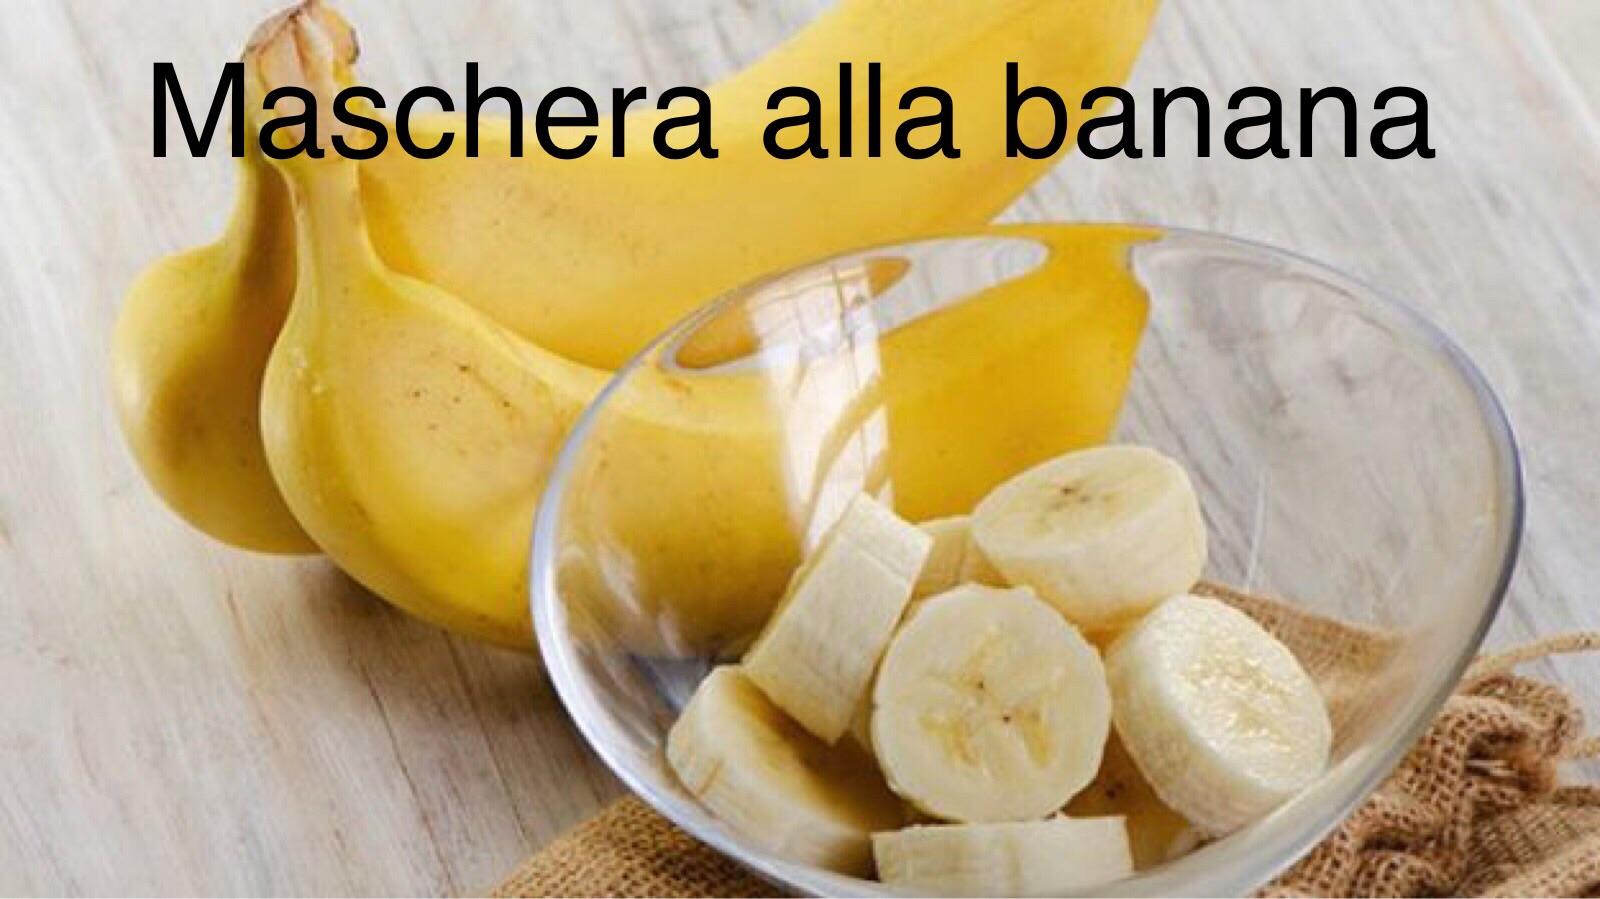 Maschera viso alla banana